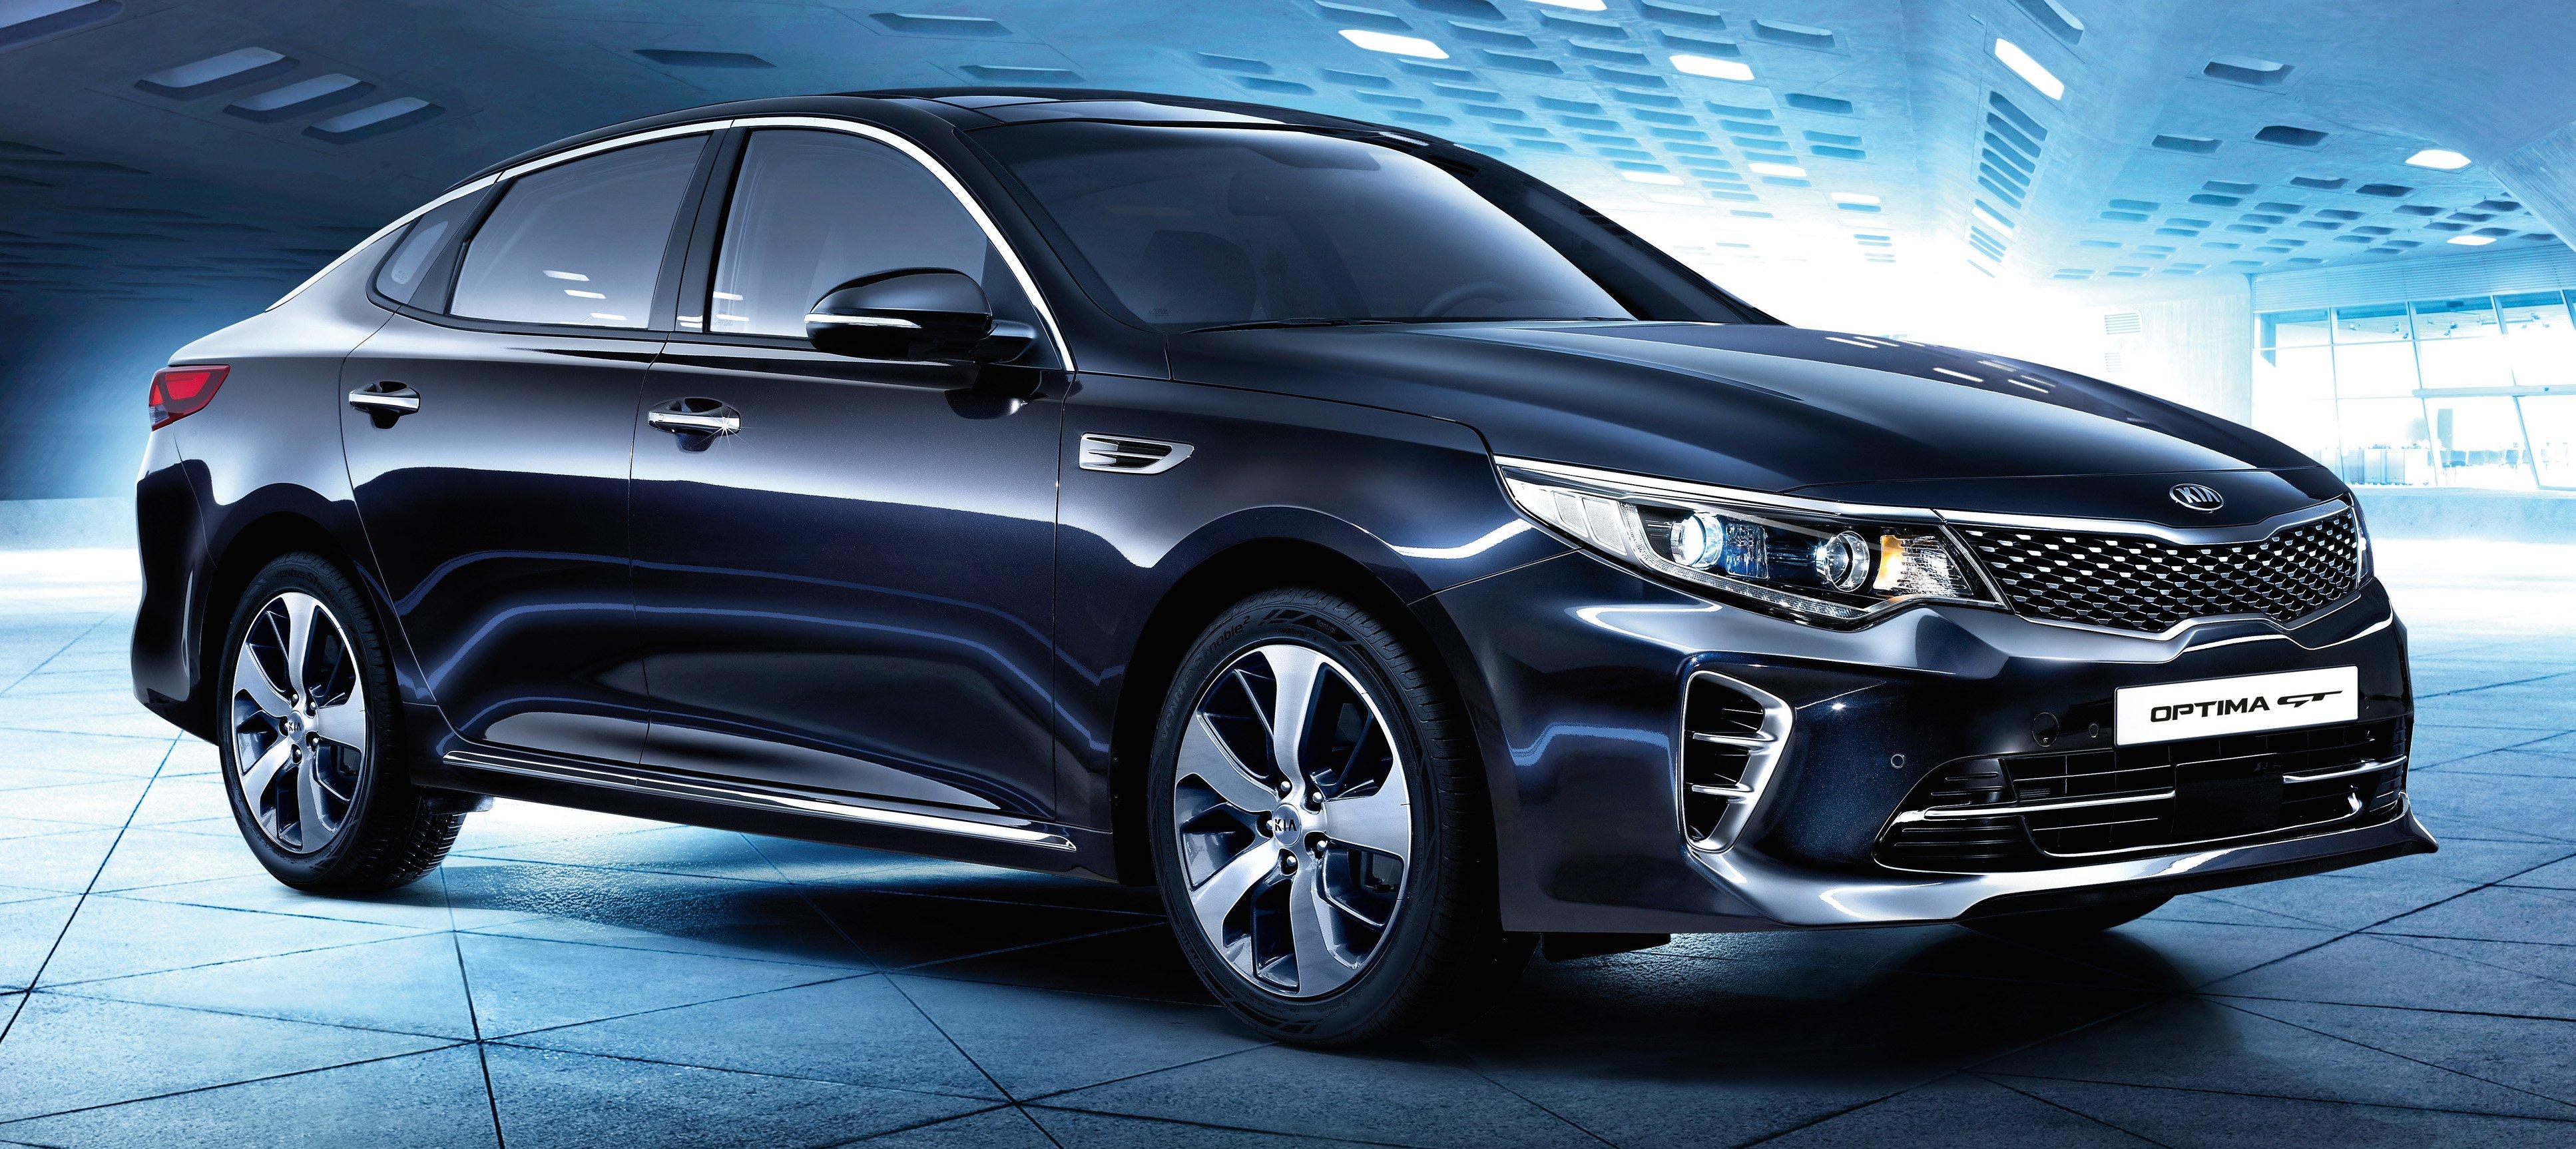 reviews speed gdi news ex optima and kia cars top